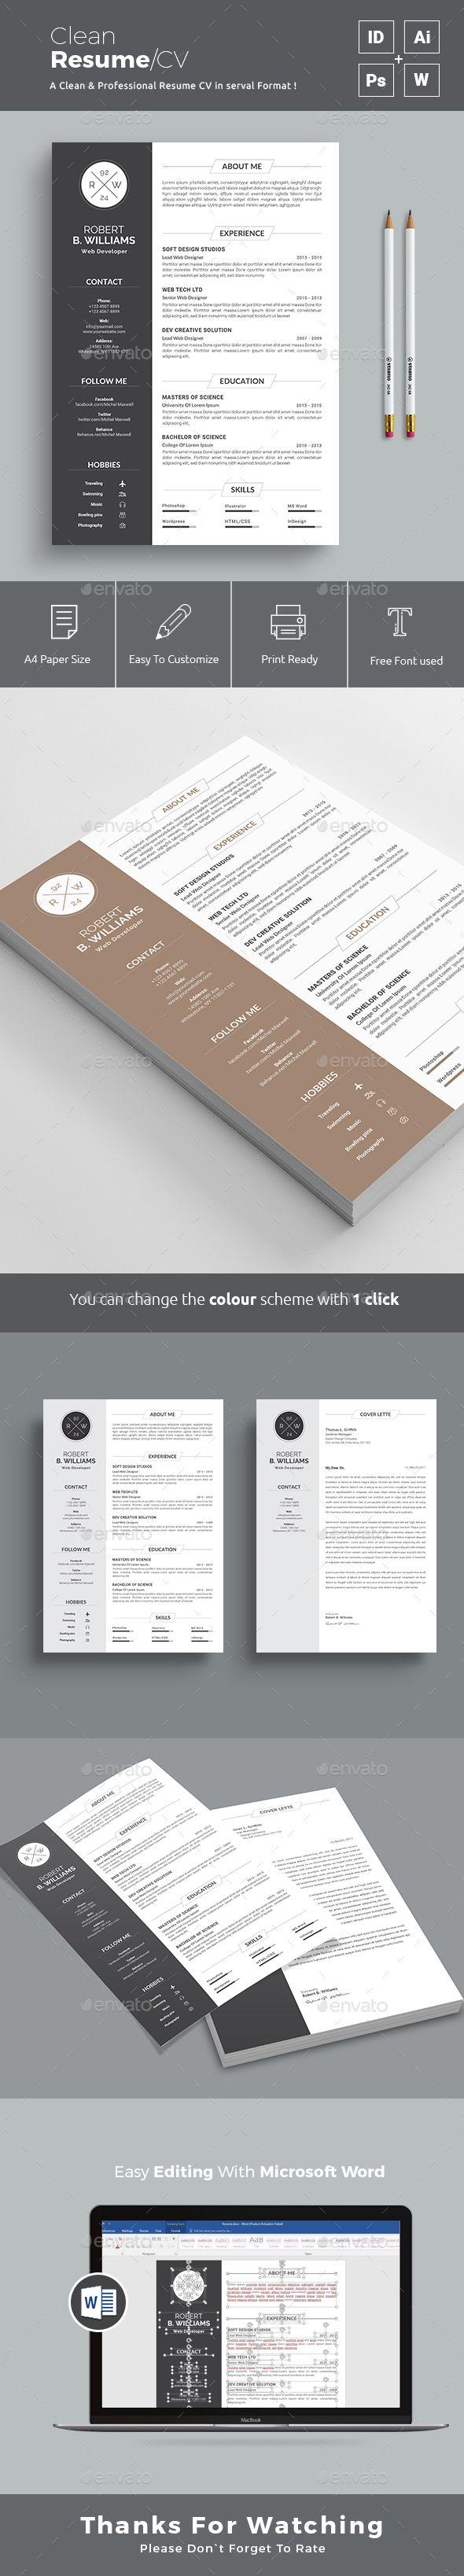 best ideas about resume design resume resume 17 best ideas about resume design resume resume writing and cv design